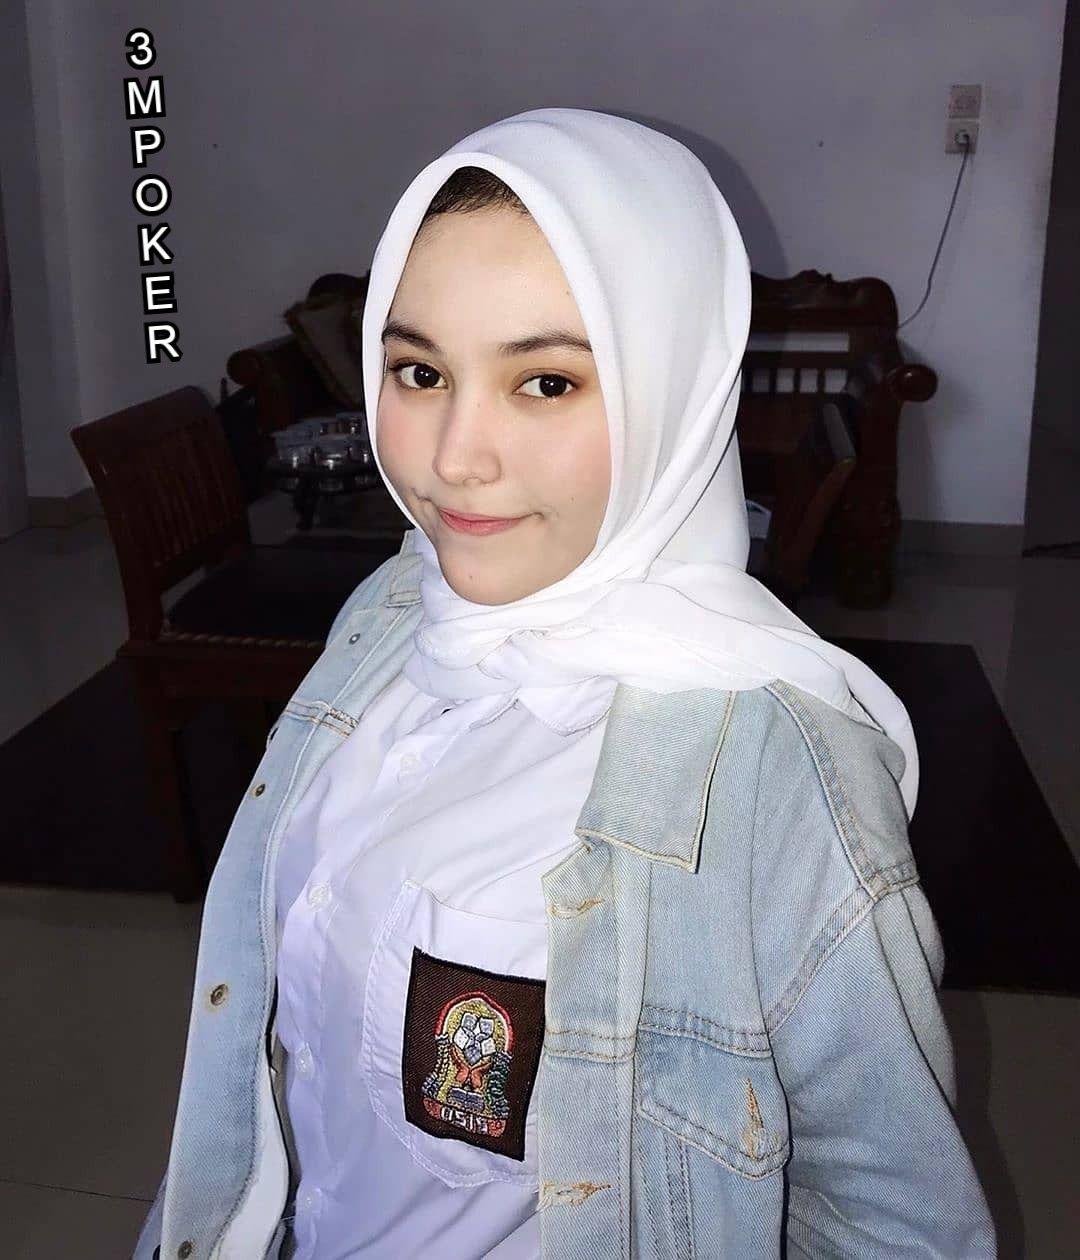 Cewek Manis In 2020 Girl Hijab Hijab Chic Aesthetic Girl